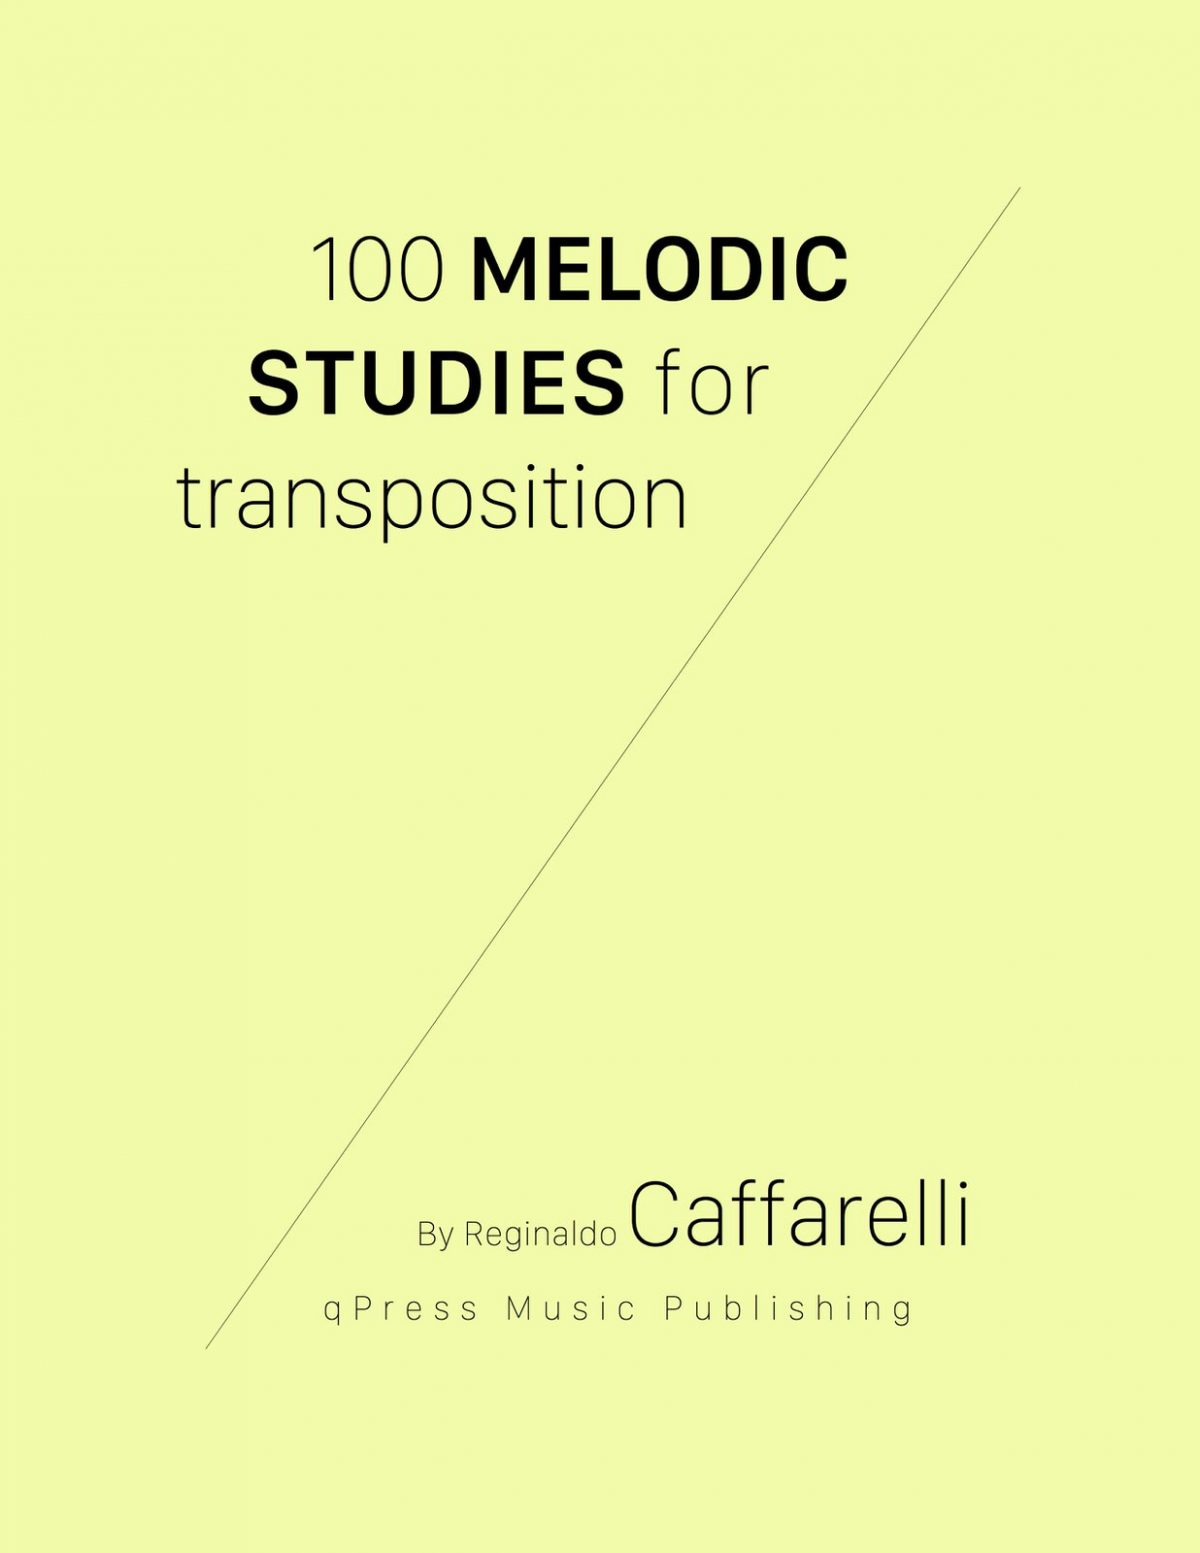 Caffarelli, 100 Studi Melodici-p01